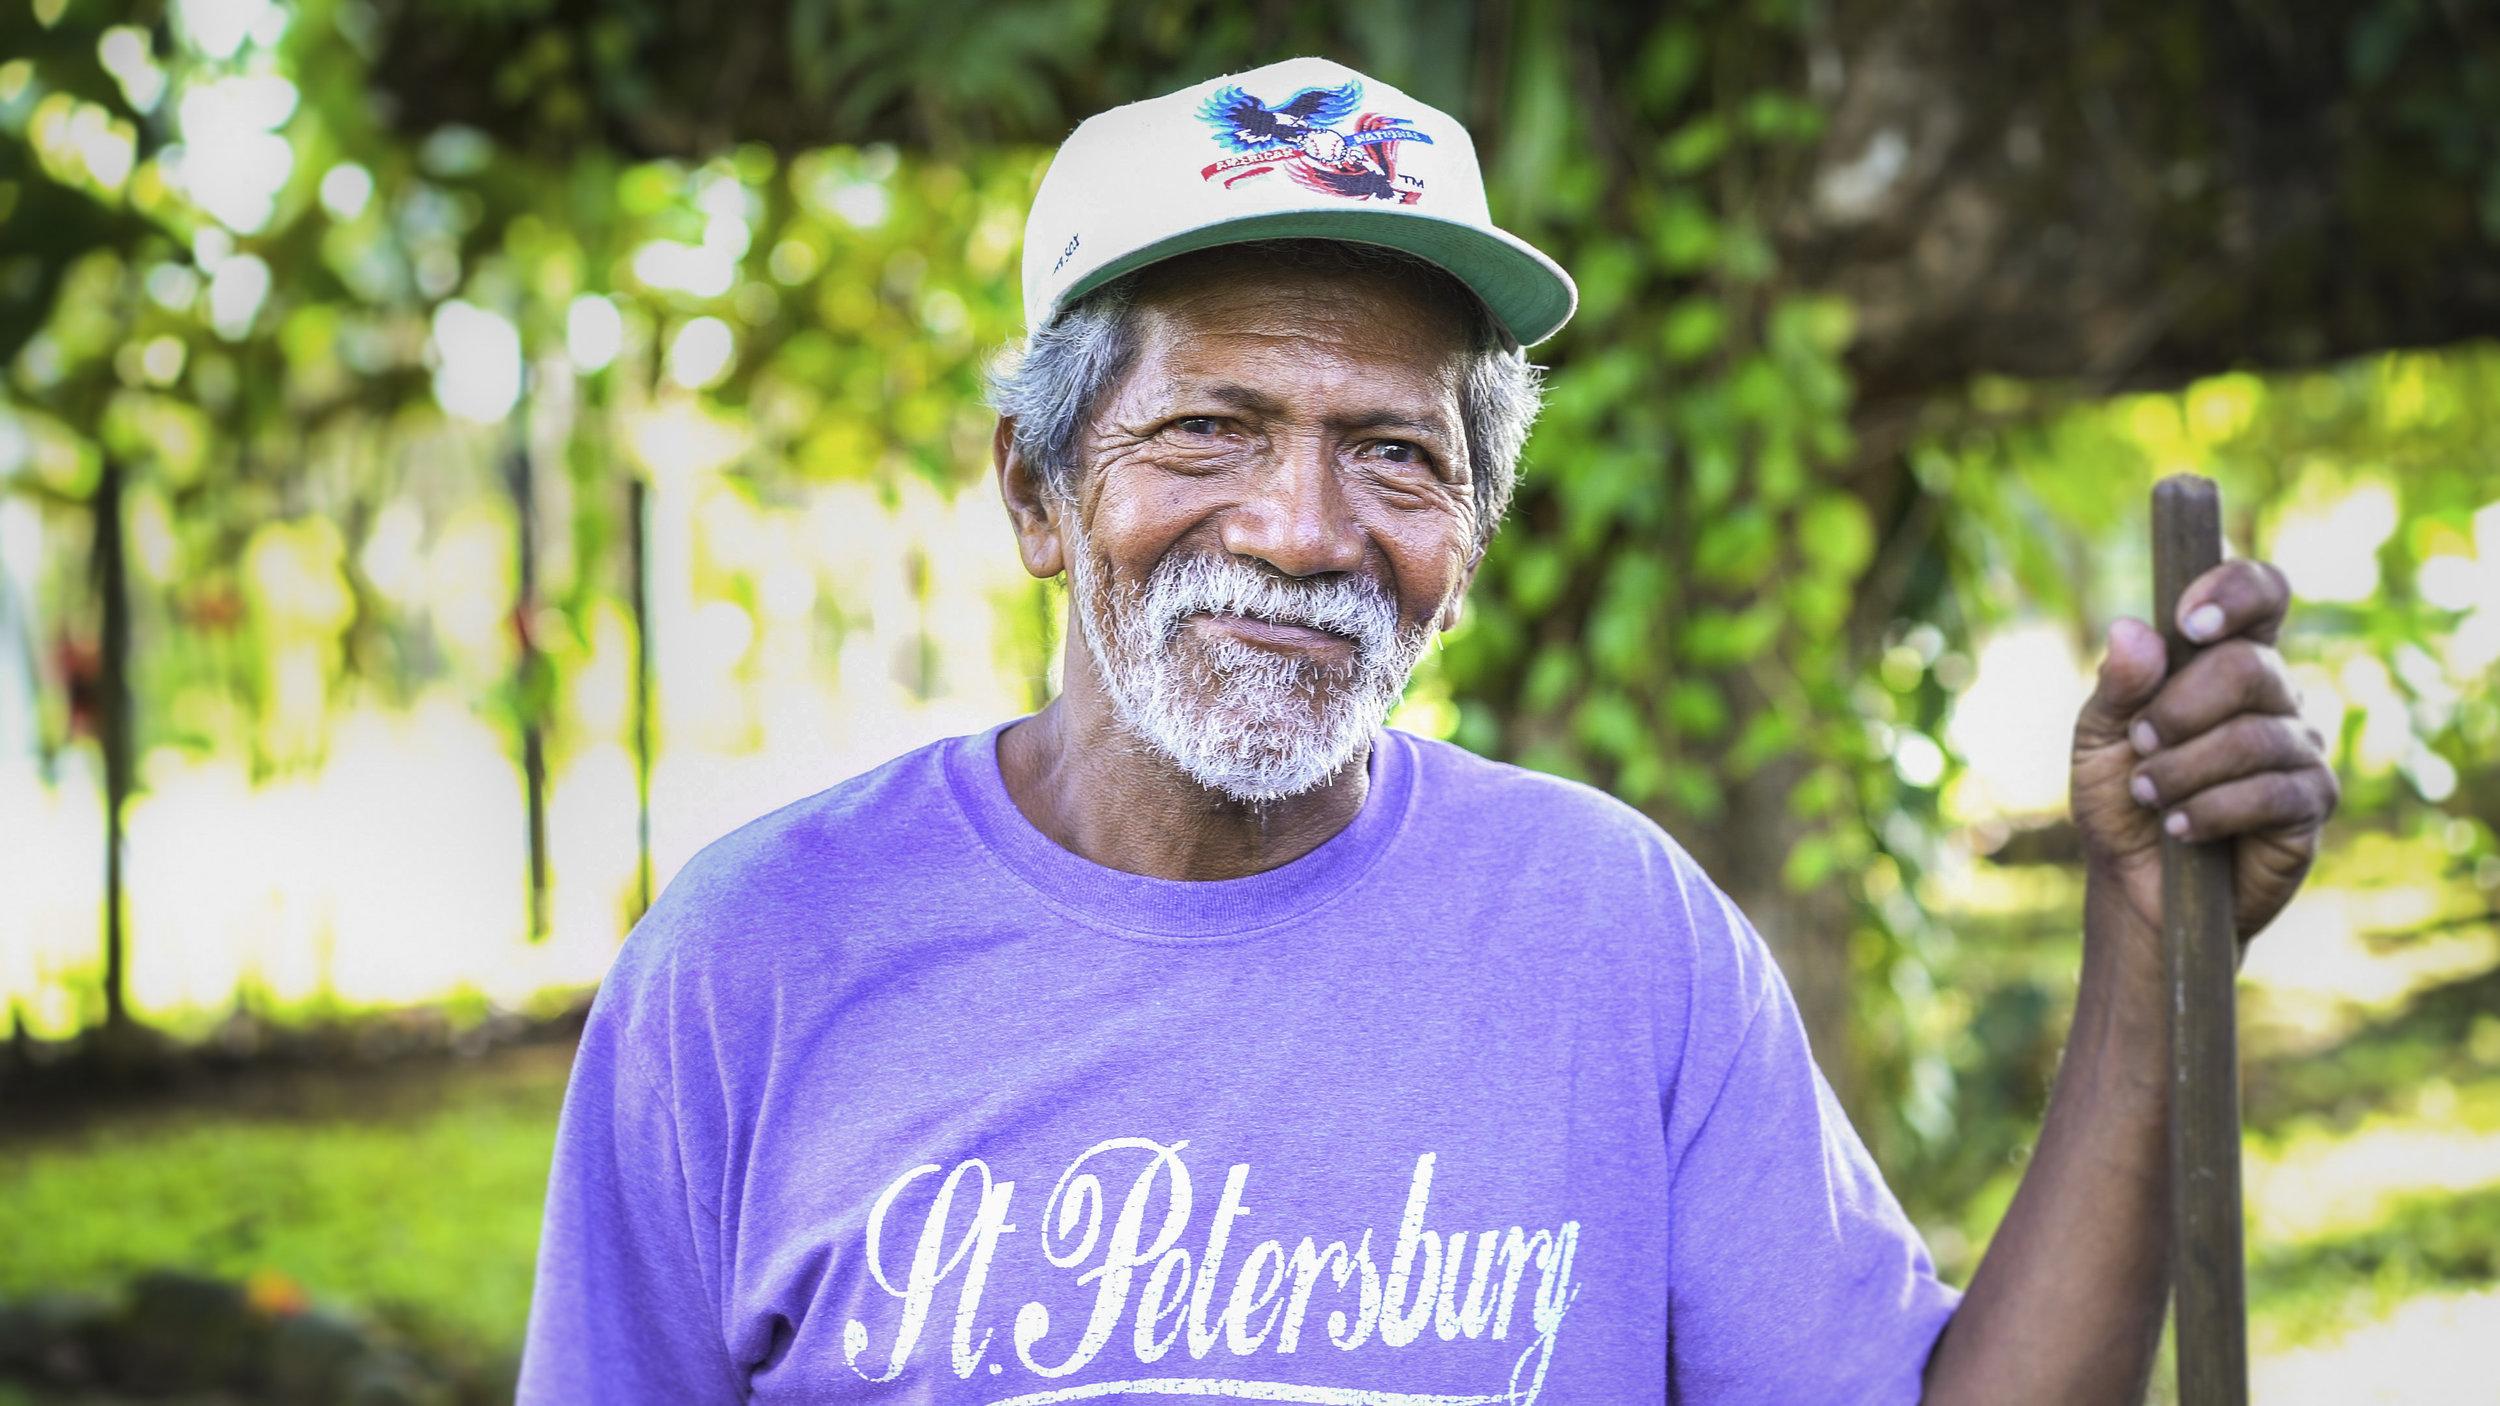 Costa Rican old man portrait